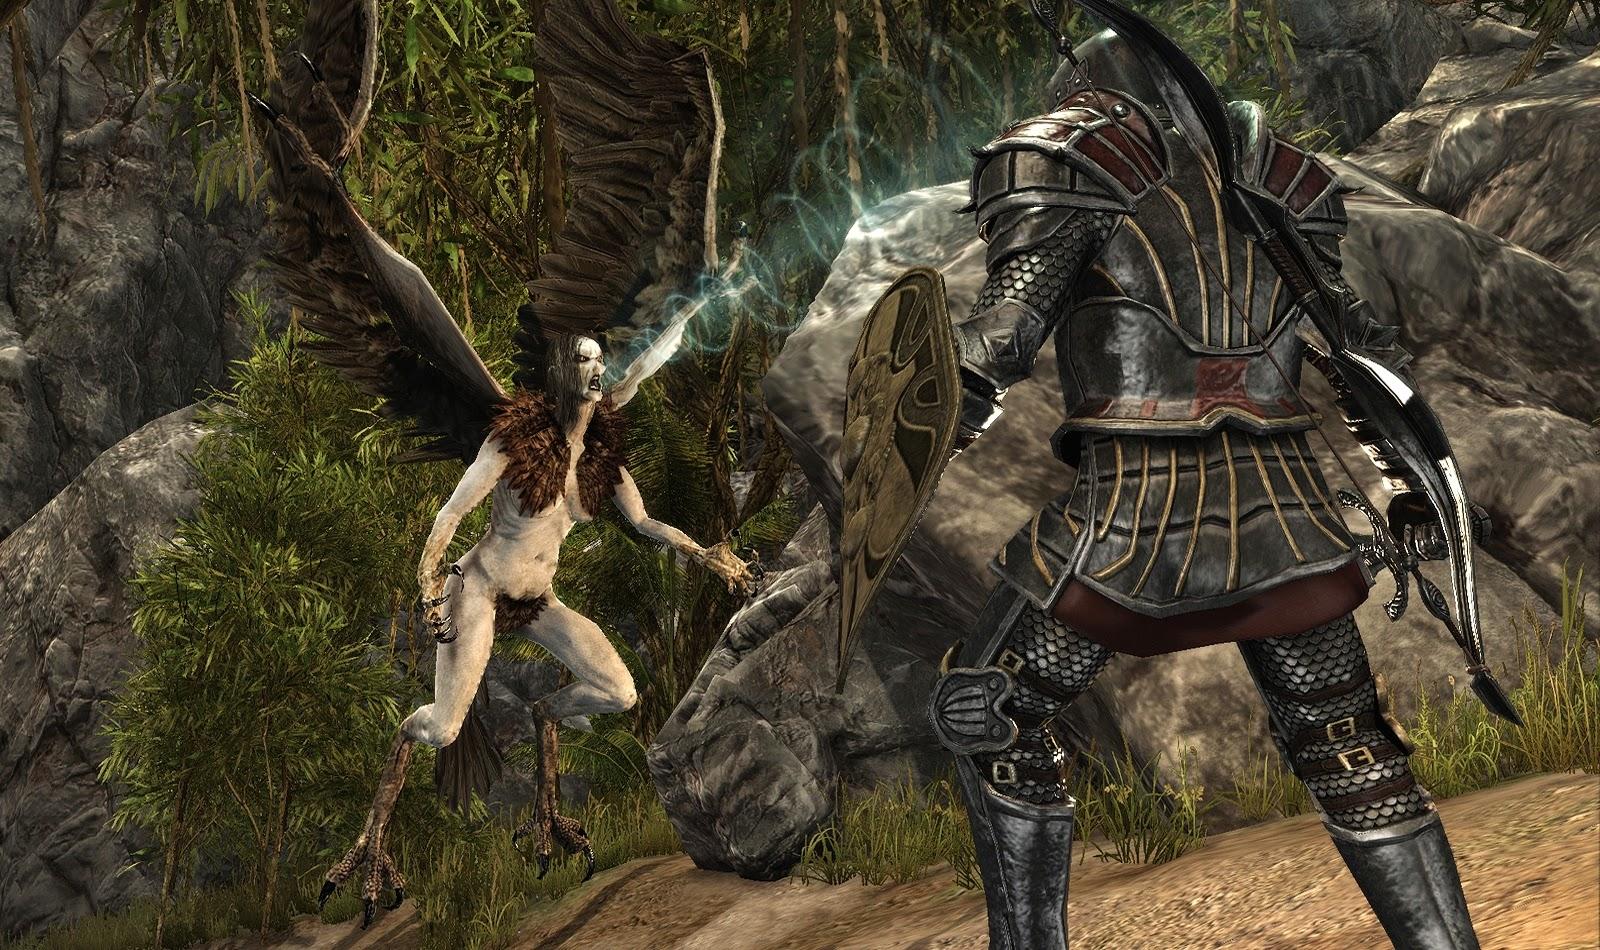 Arcania-Fall-of-Setarrif-Game